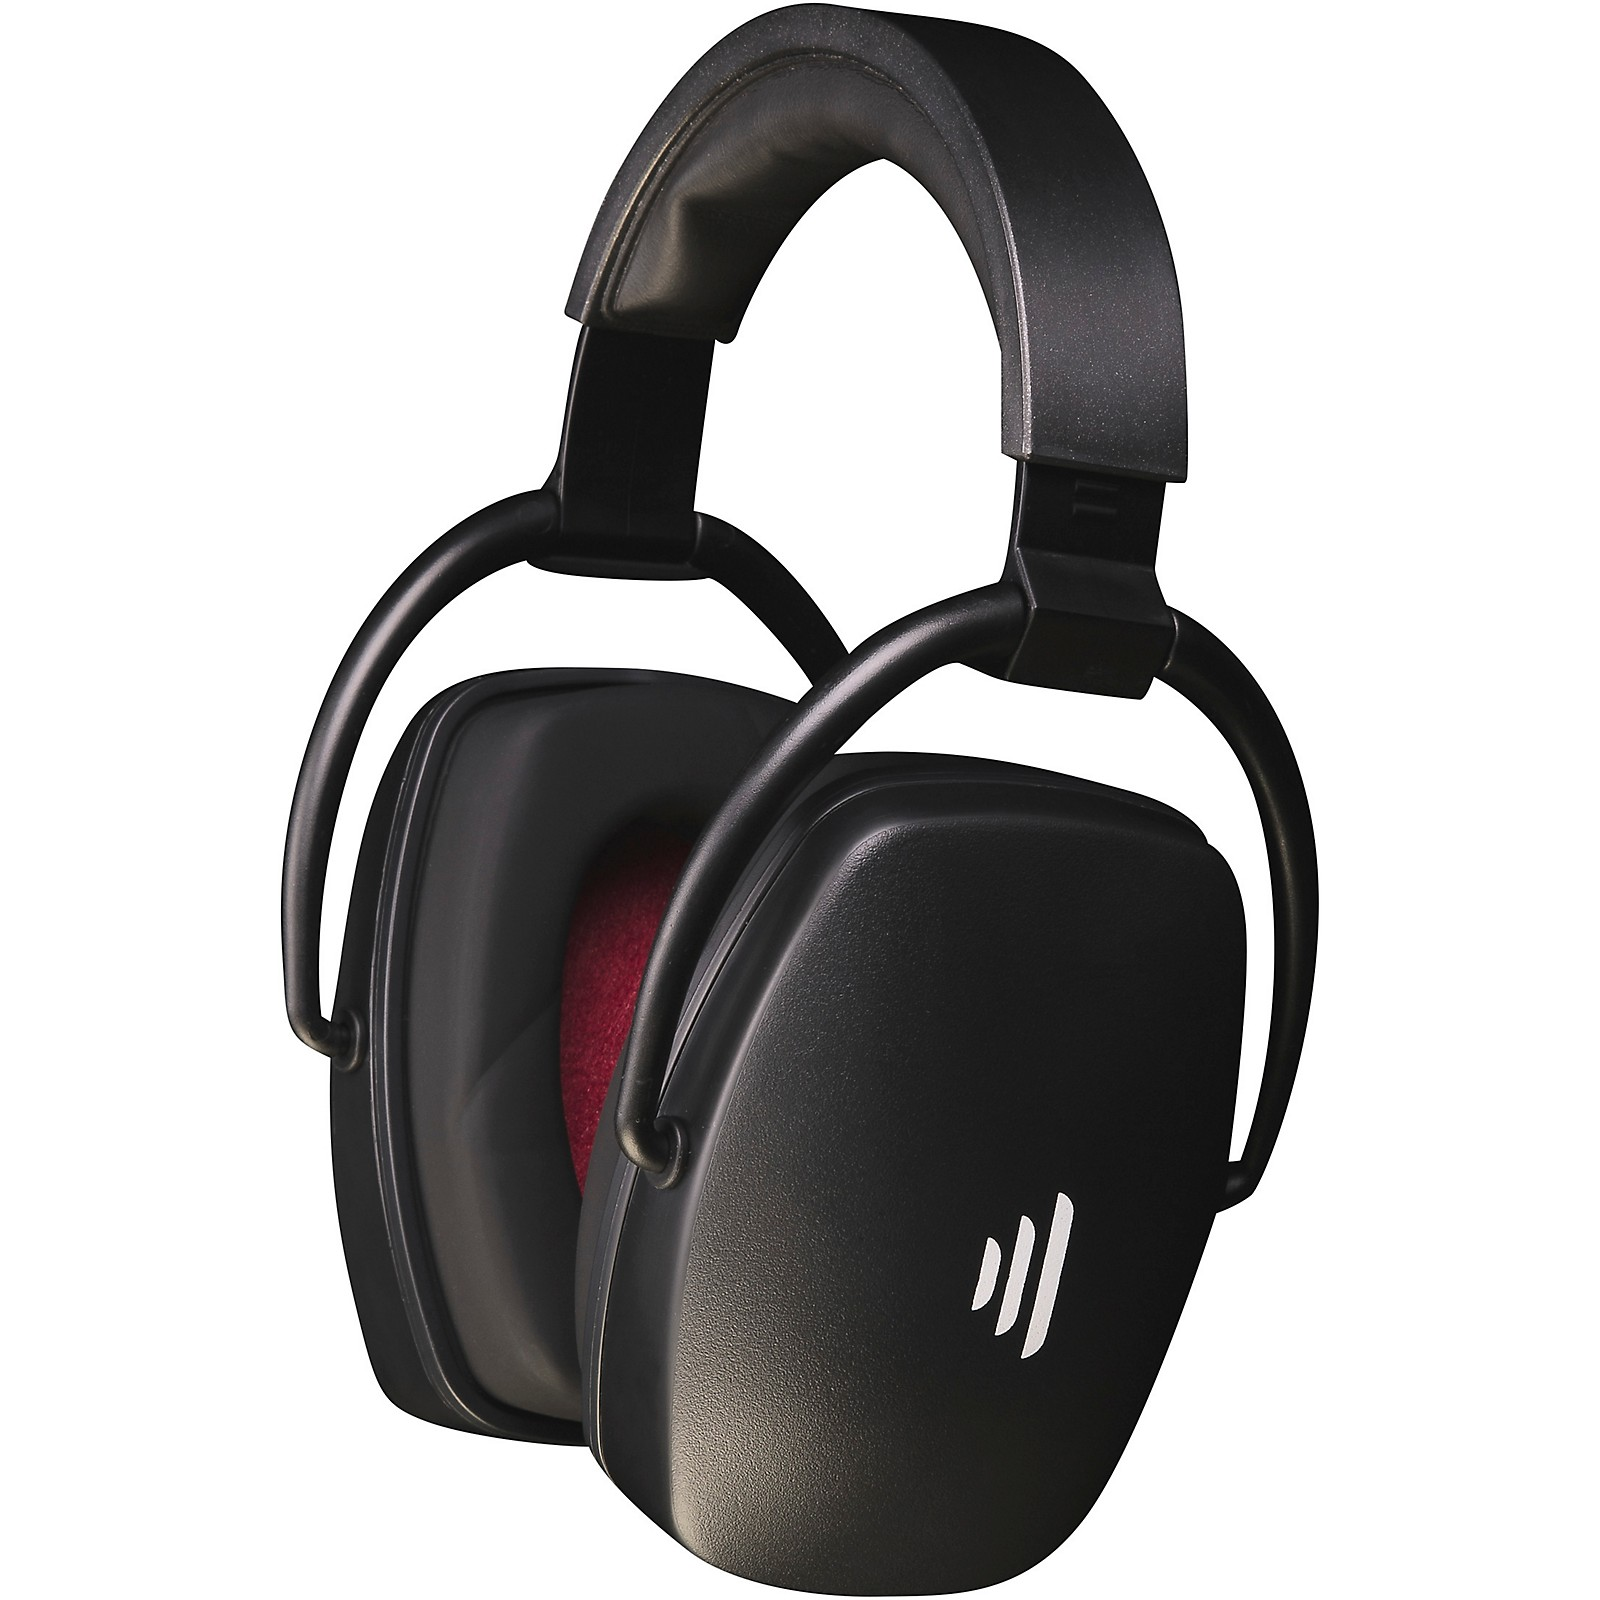 Open Box Direct Sound EX29 Plus Extreme Isolation Headphone in Midnight Black